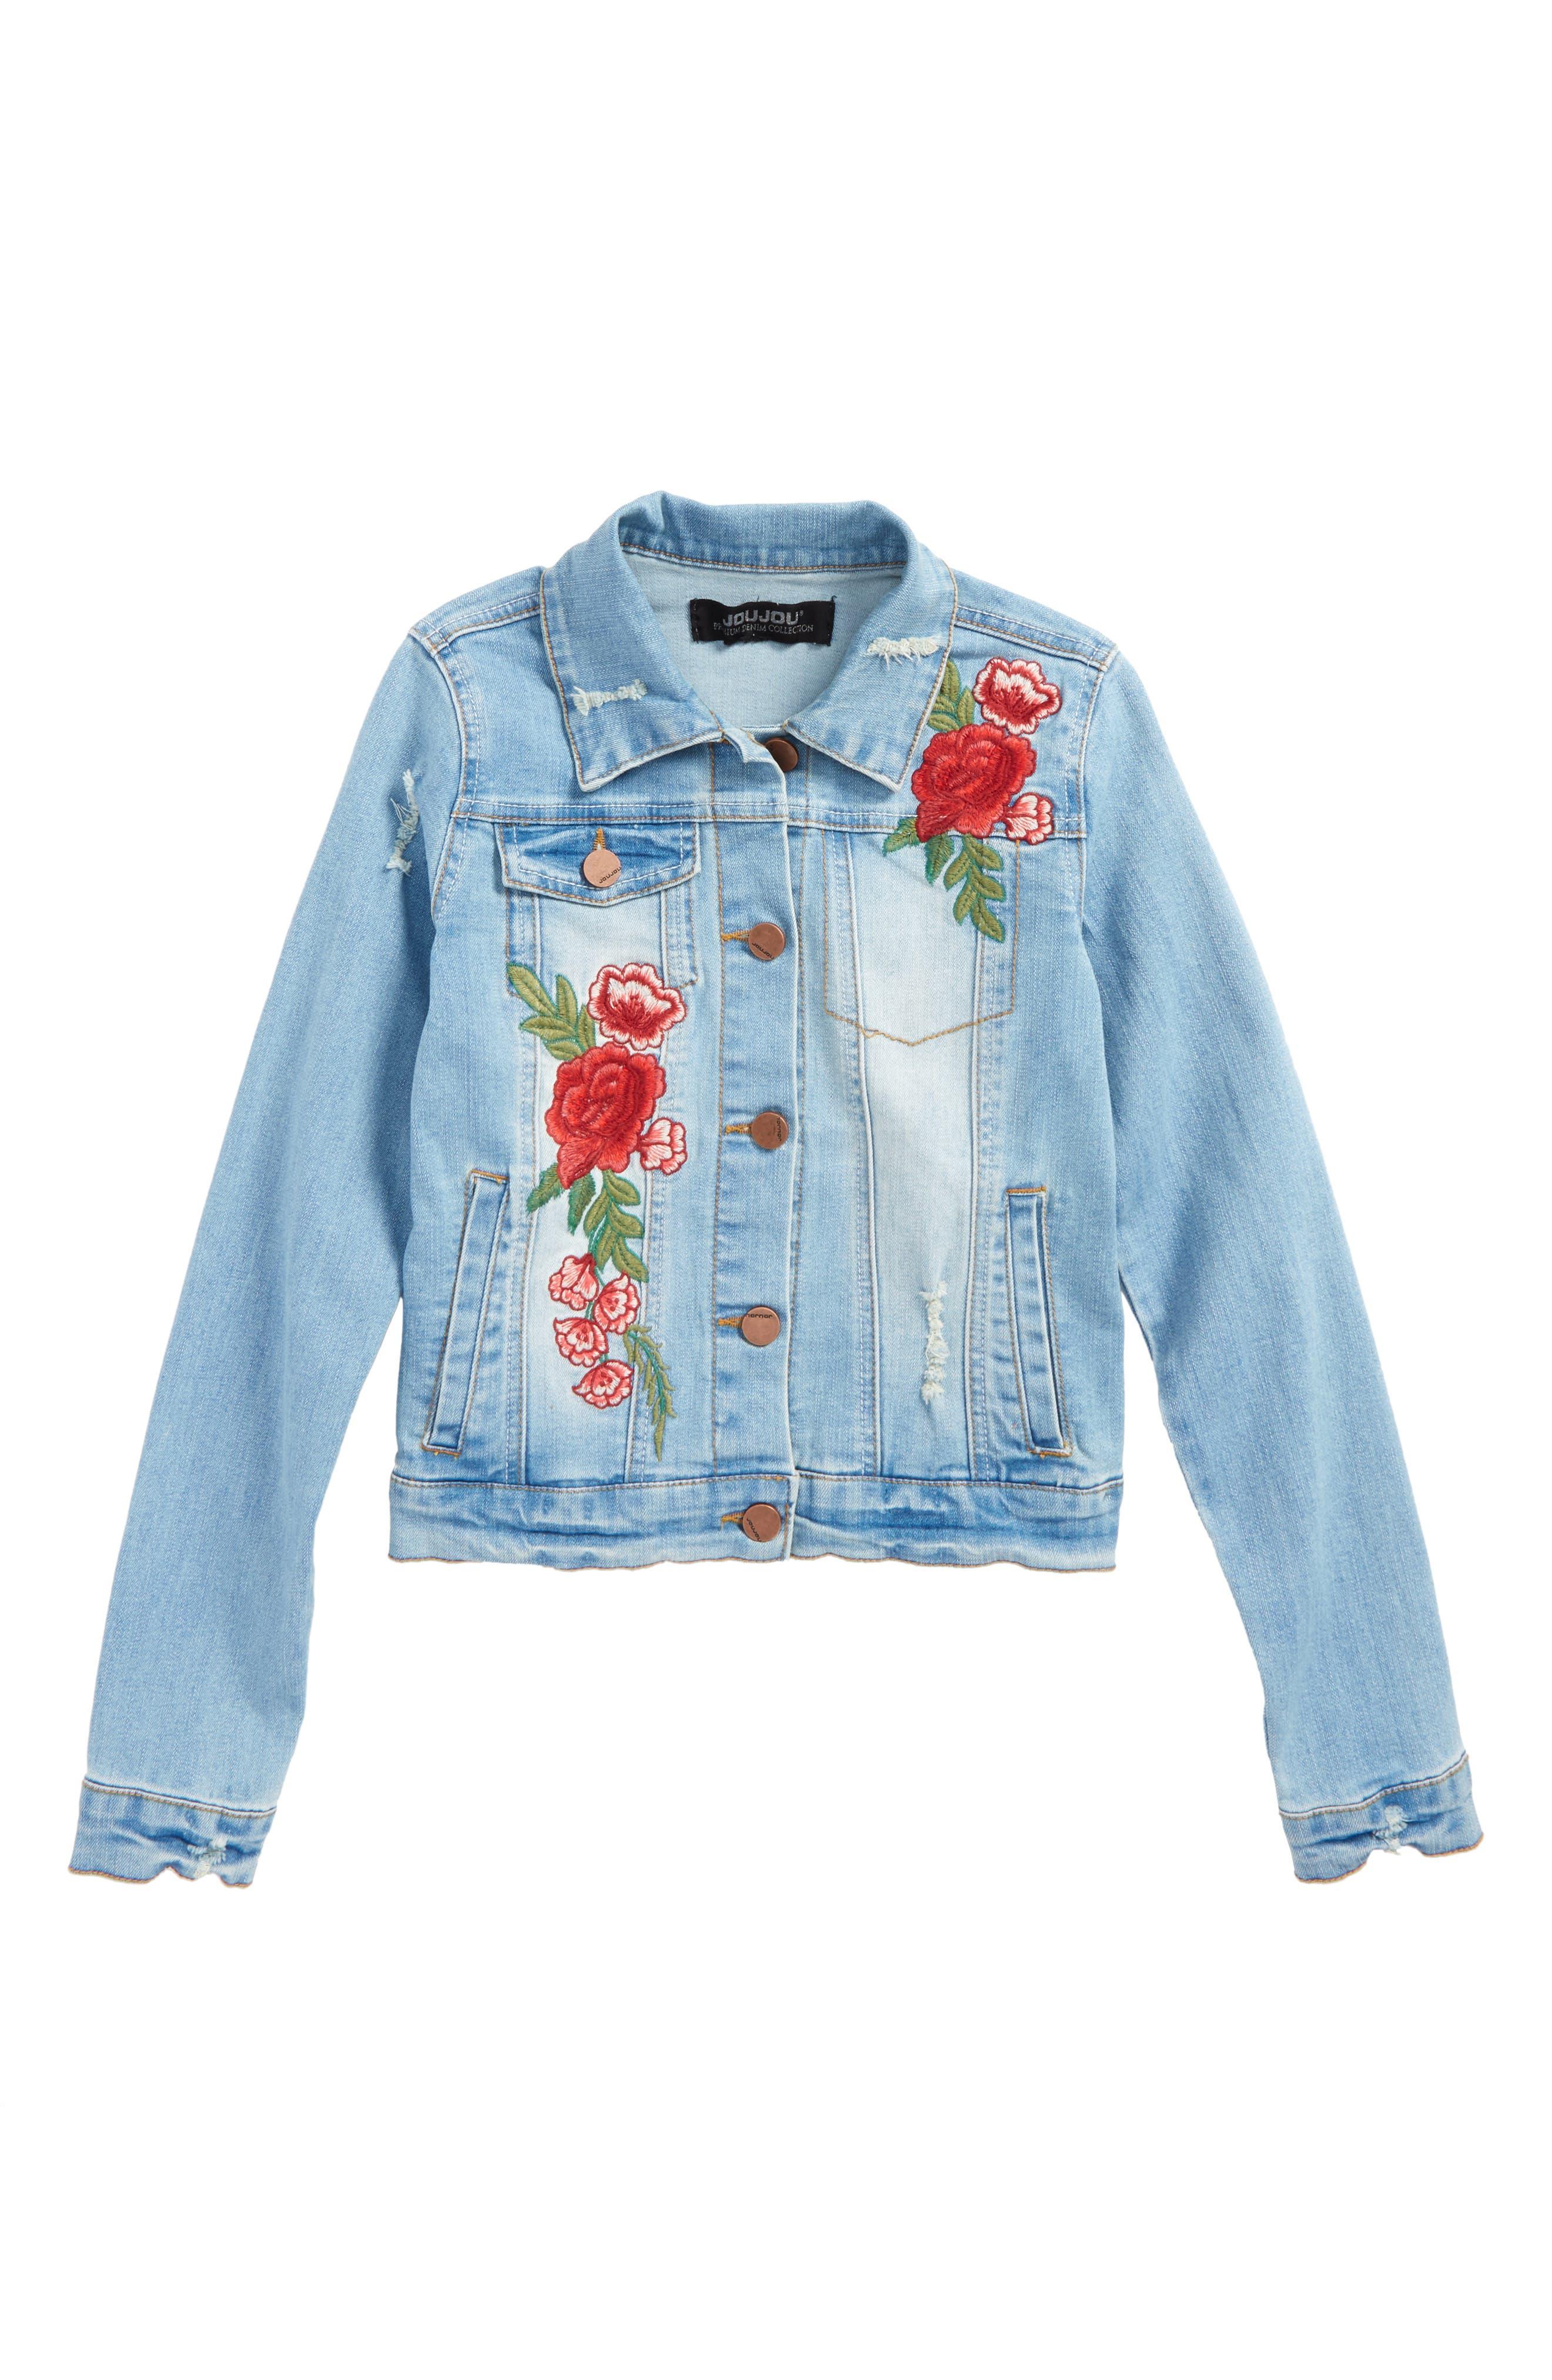 Jou Jou Embroidered Denim Jacket (Big Girls)